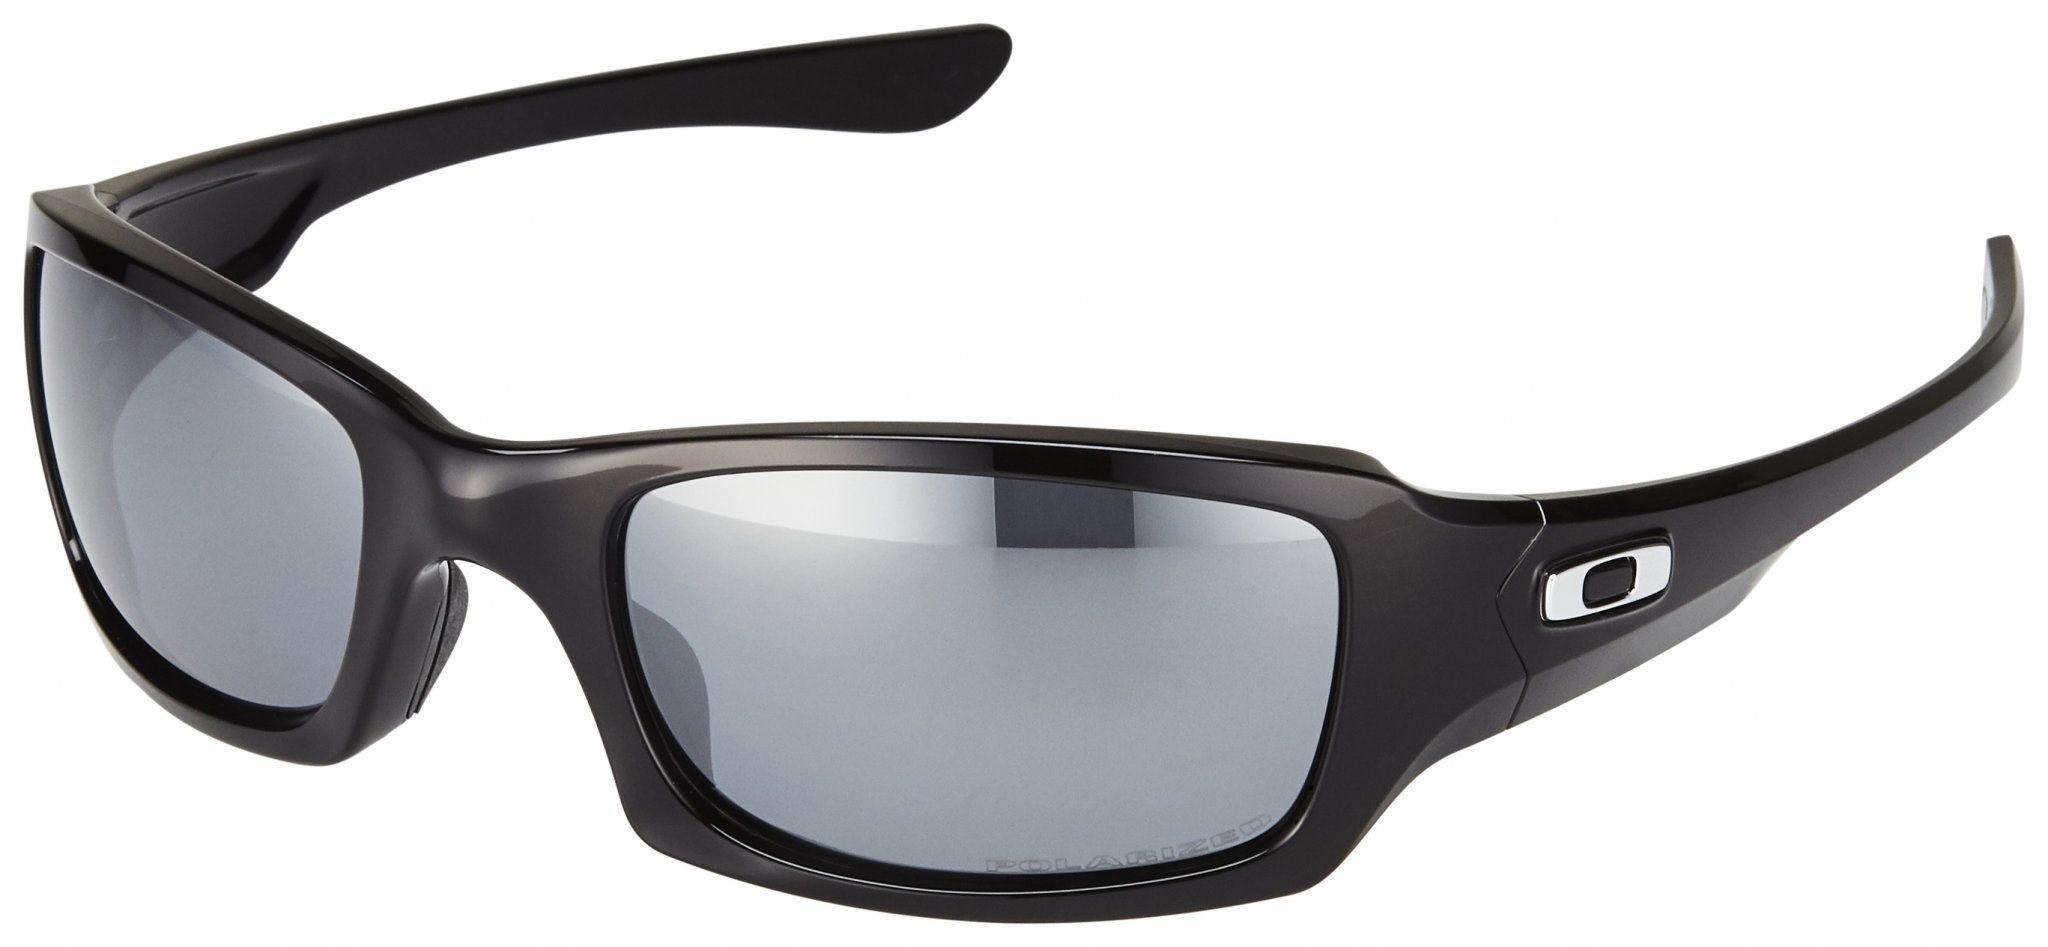 Oakley Radsportbrille »Oakley Fives Squared«